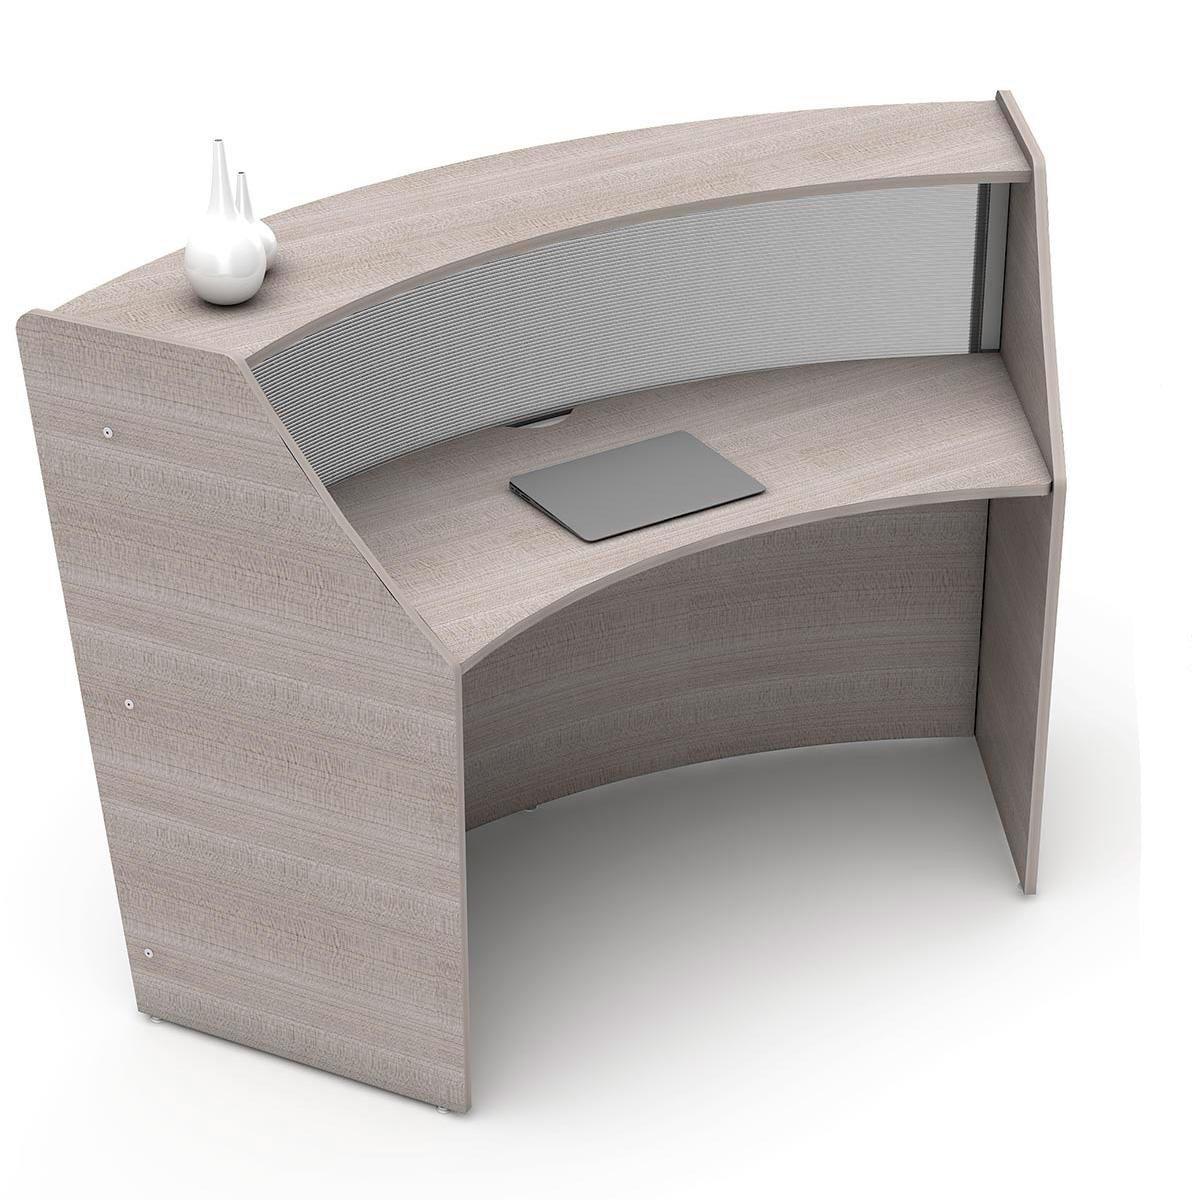 Linea Italia Curved Reception Desk, Single Unit, Clear Panel, Ash Laminate, Modern Office Lobby, Perfect for Small Spaces, Receptionist, Secretary